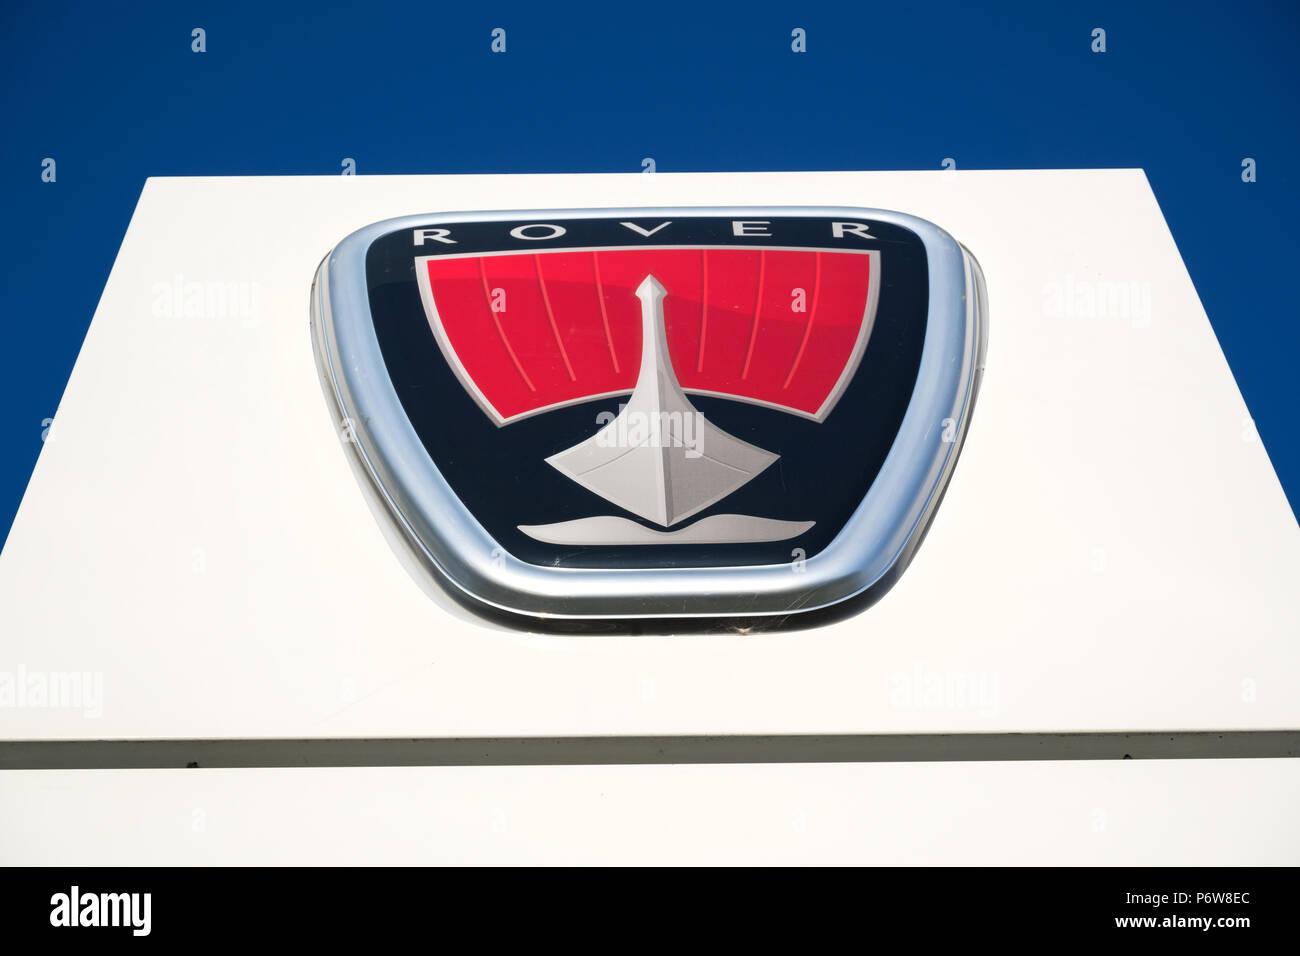 Rover dealership sign against blue sky. - Stock Image